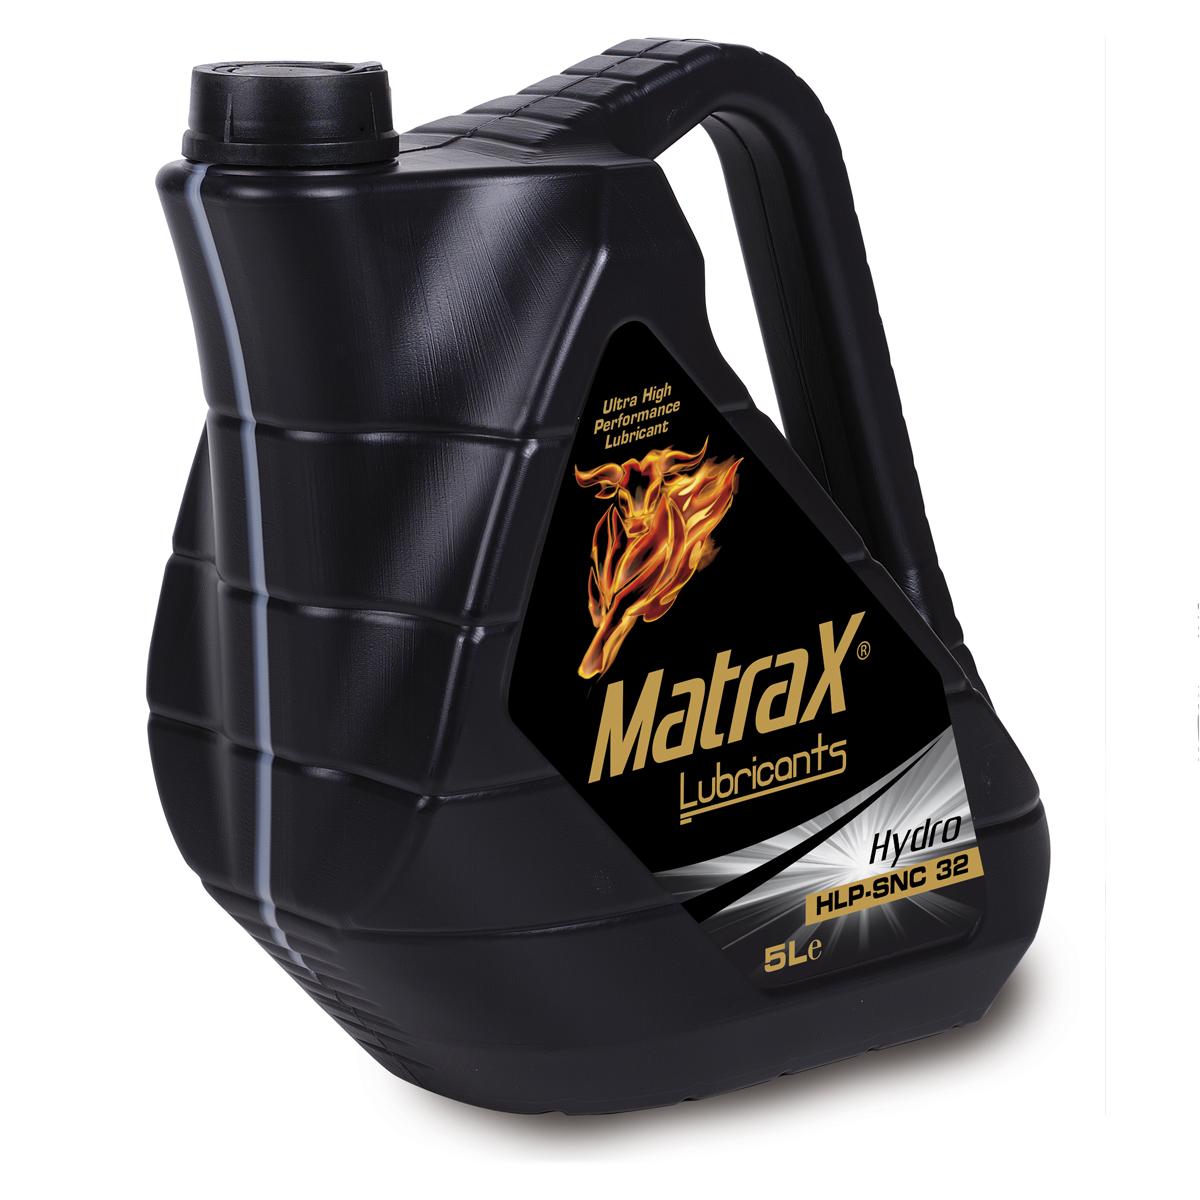 MatraX Hydro HLP-SNC 32